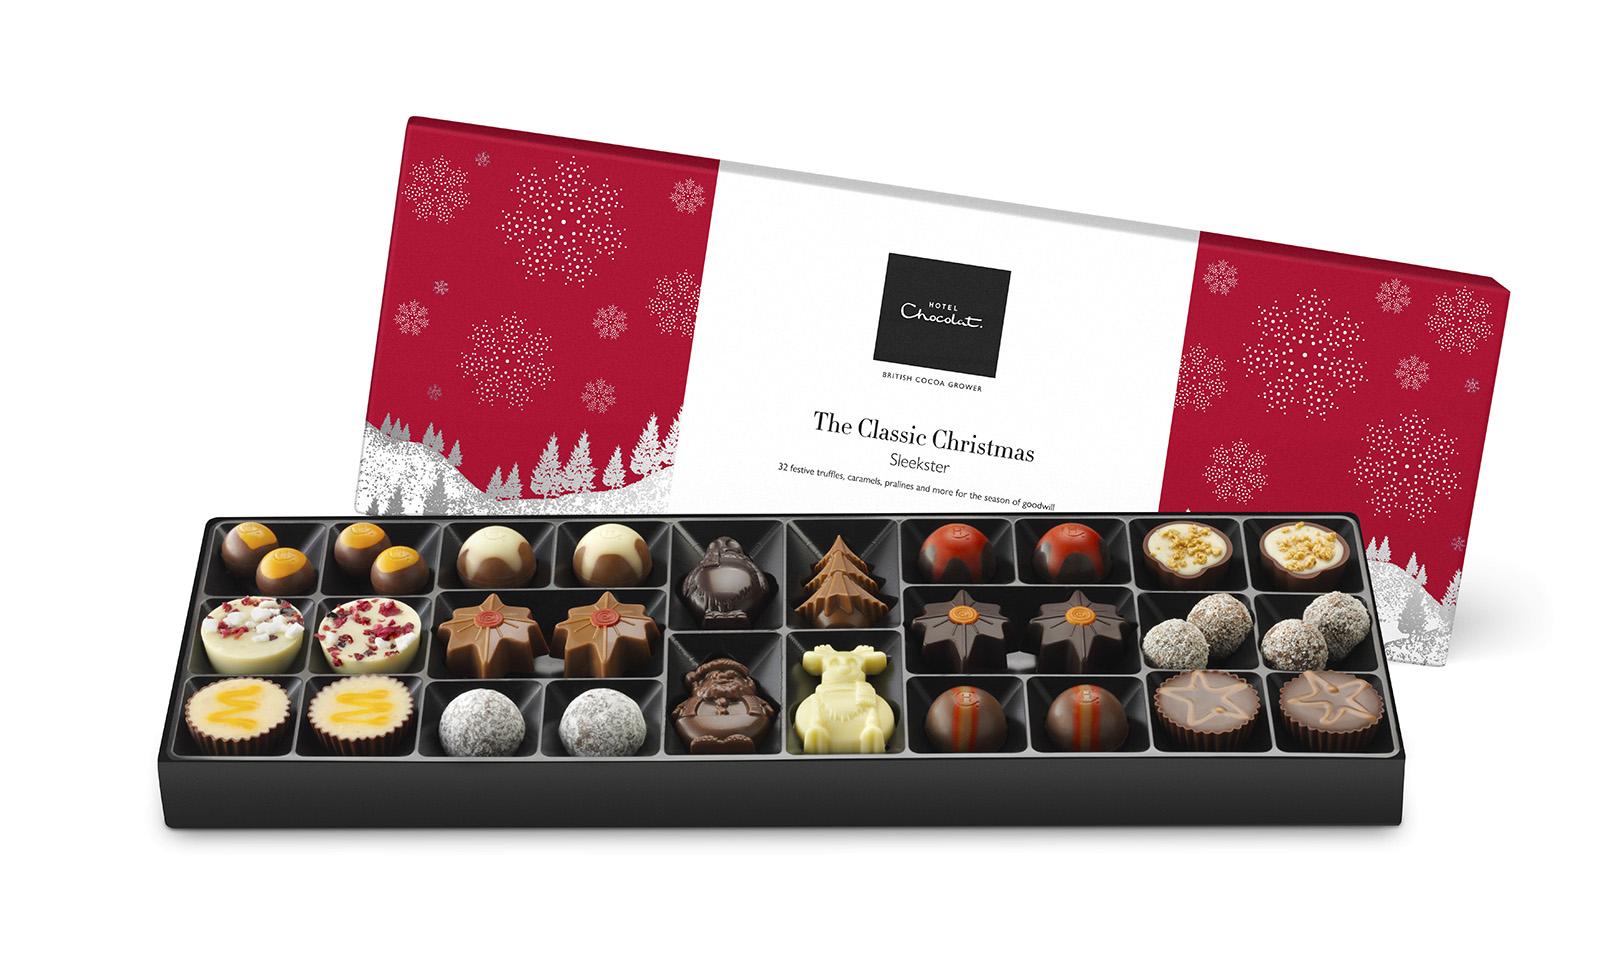 Christmas Sleekster from Hotel Chocolat